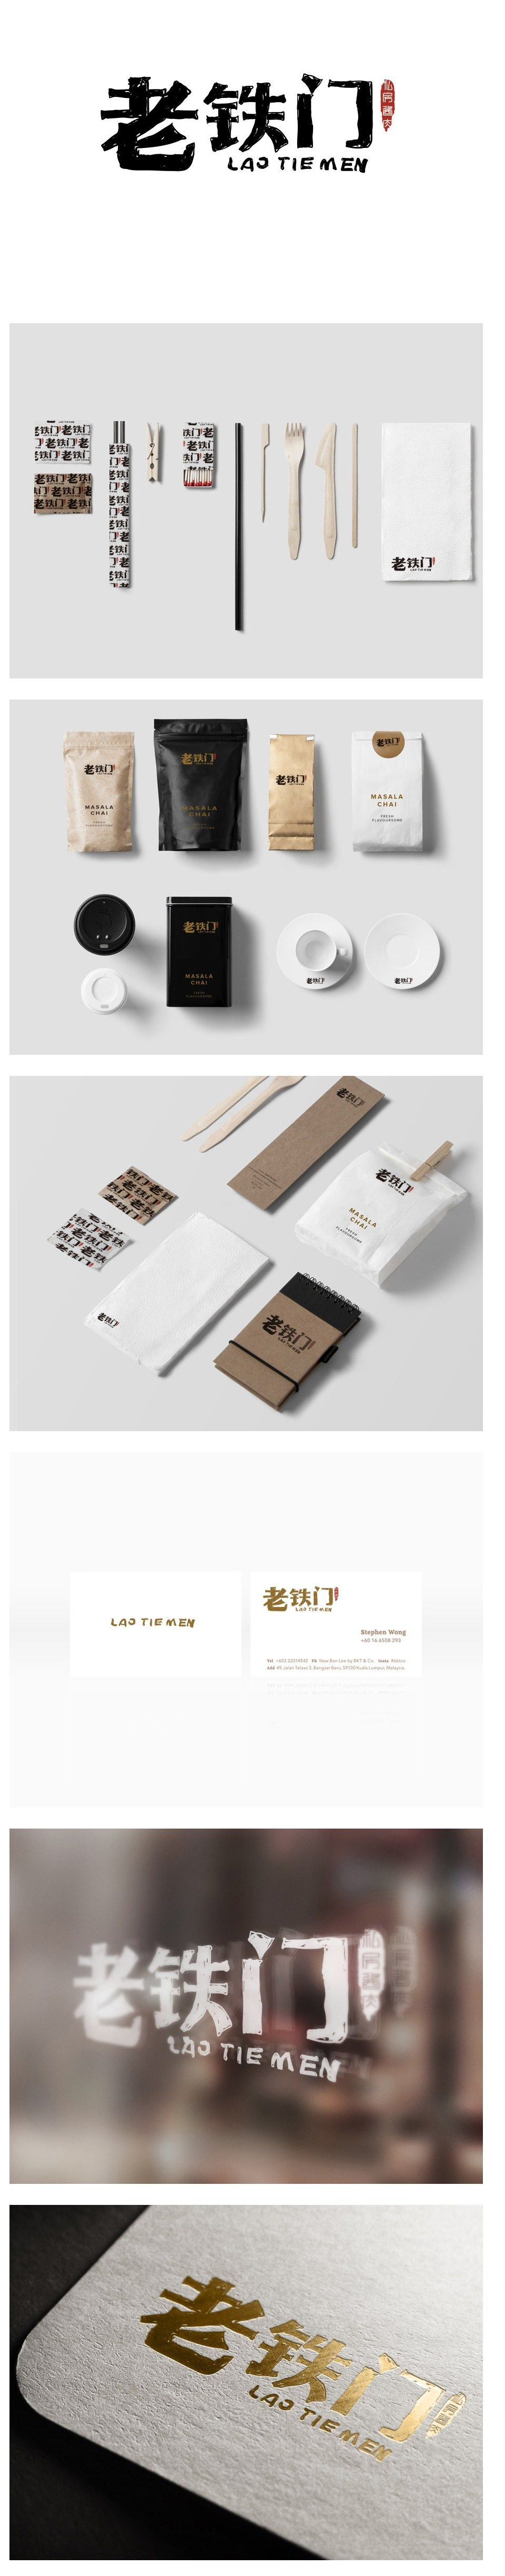 "Design of visual VI for restaurant brand ""Old Iron Gate"""